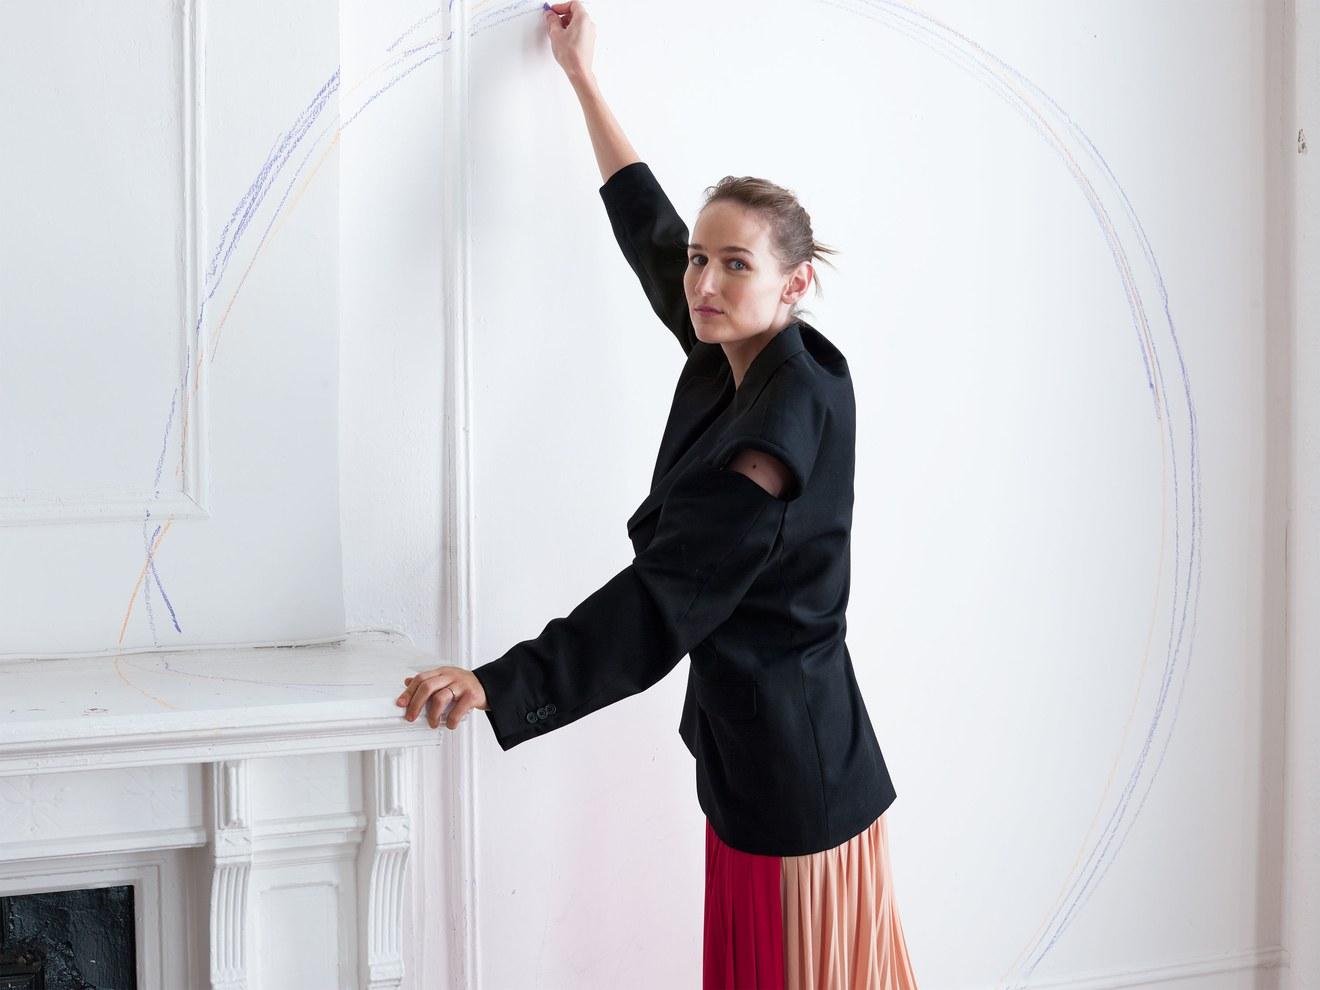 Blazer Bling Artistic Clothing Wardrobe Update Forever Chic by Meg